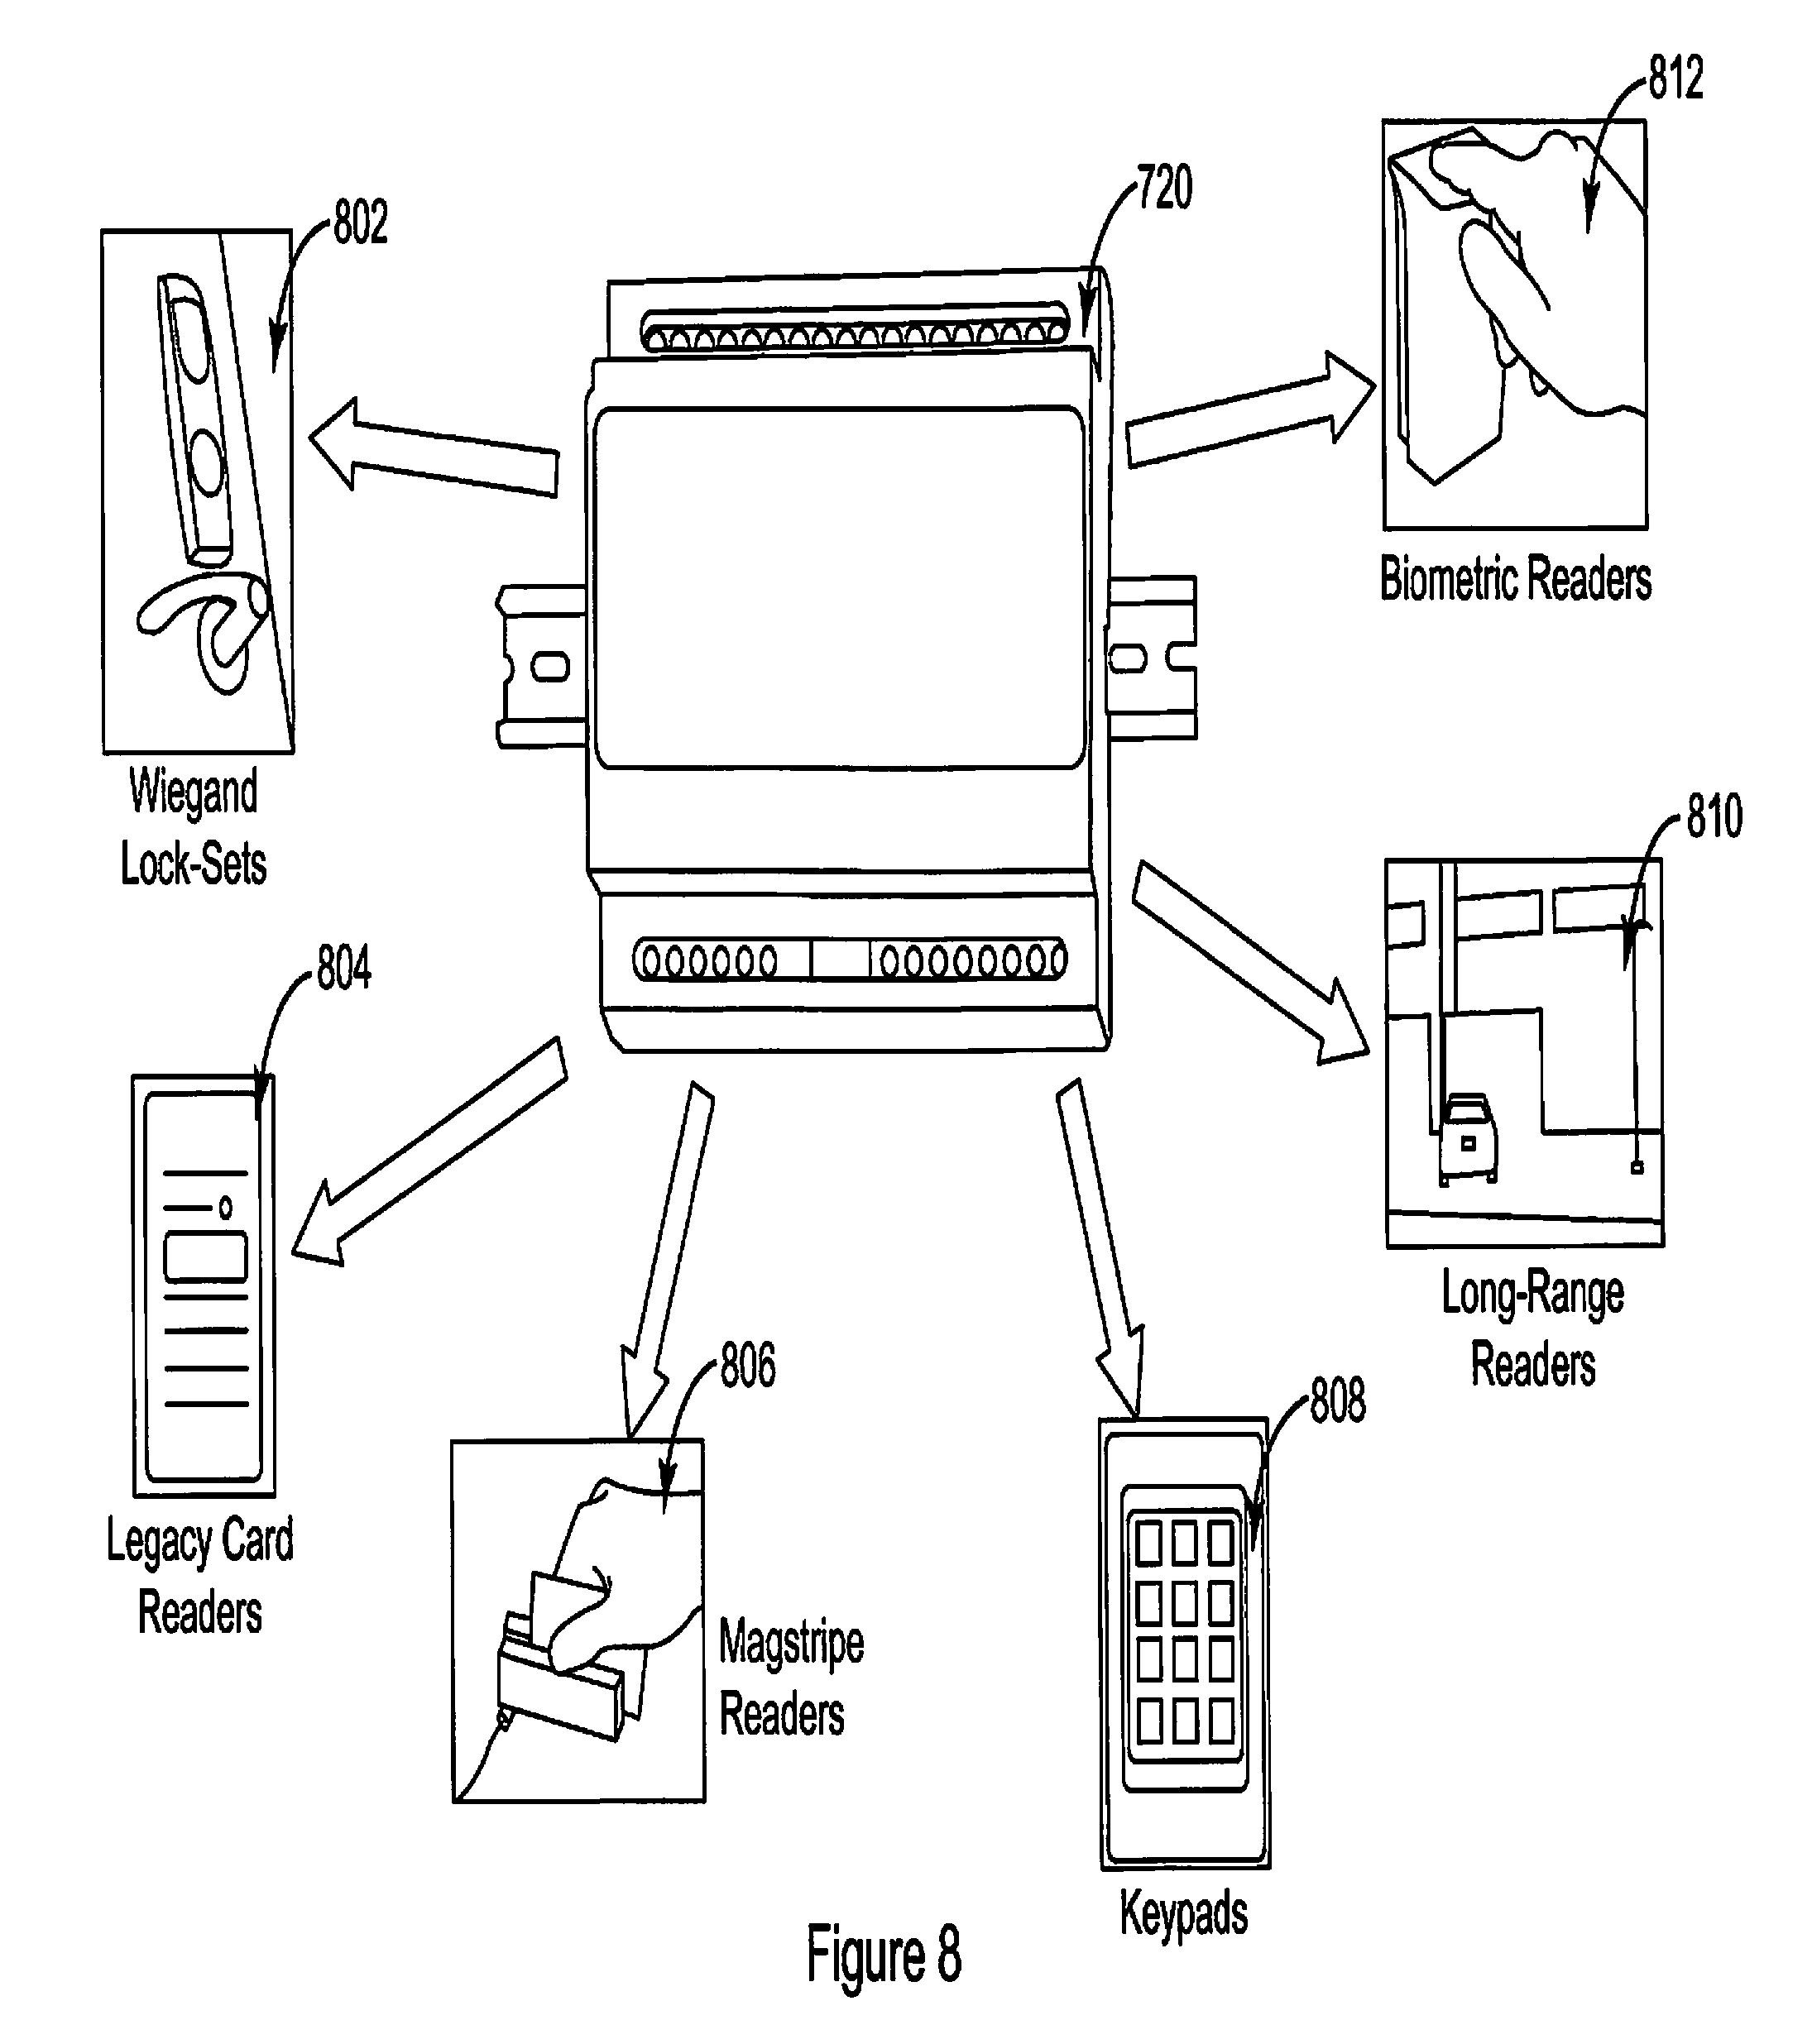 Patent US 9,558,606 B2 on